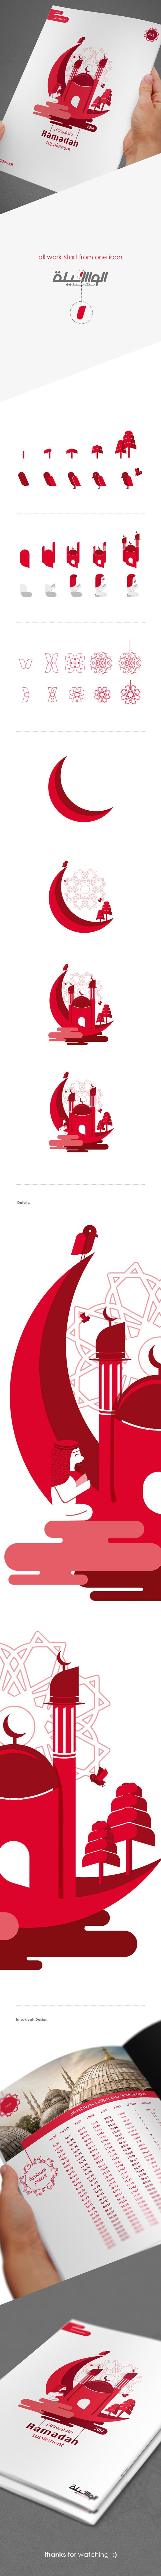 Ramadan Supplement Cover by Adeeb Ramadan, via Behance